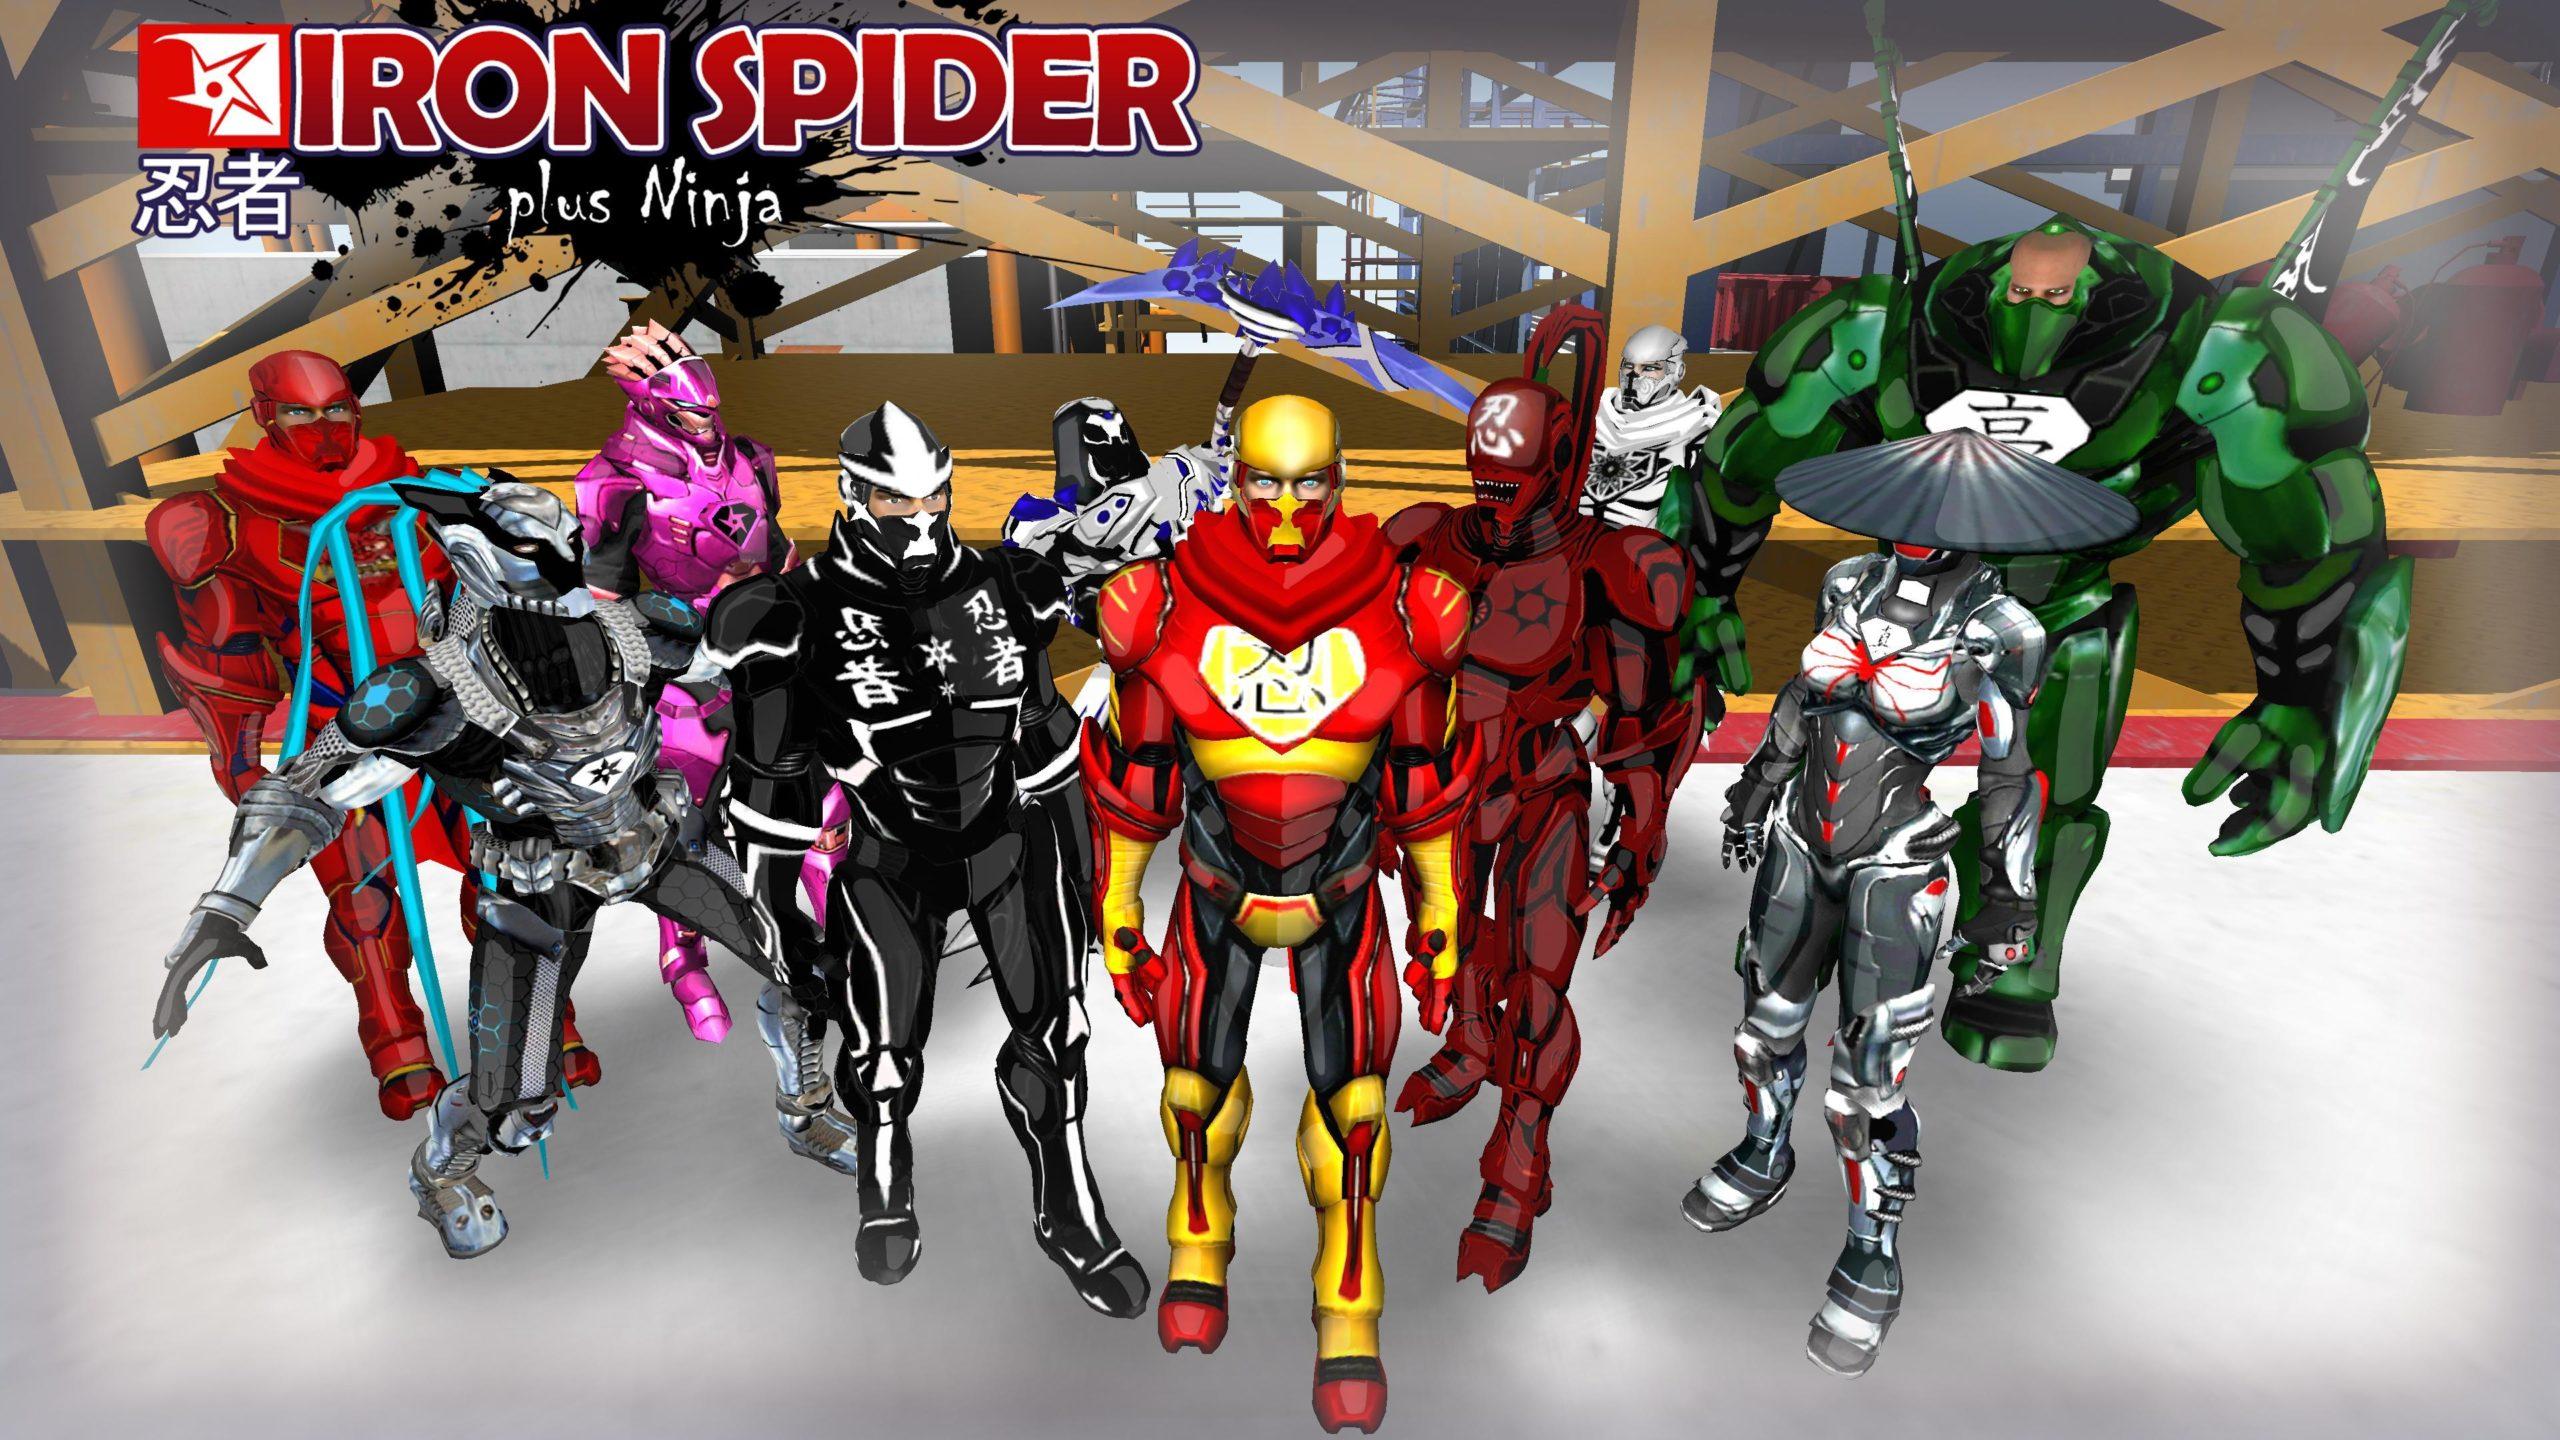 The Amazing Iron Spider v 4.01 (Mod Money) 2